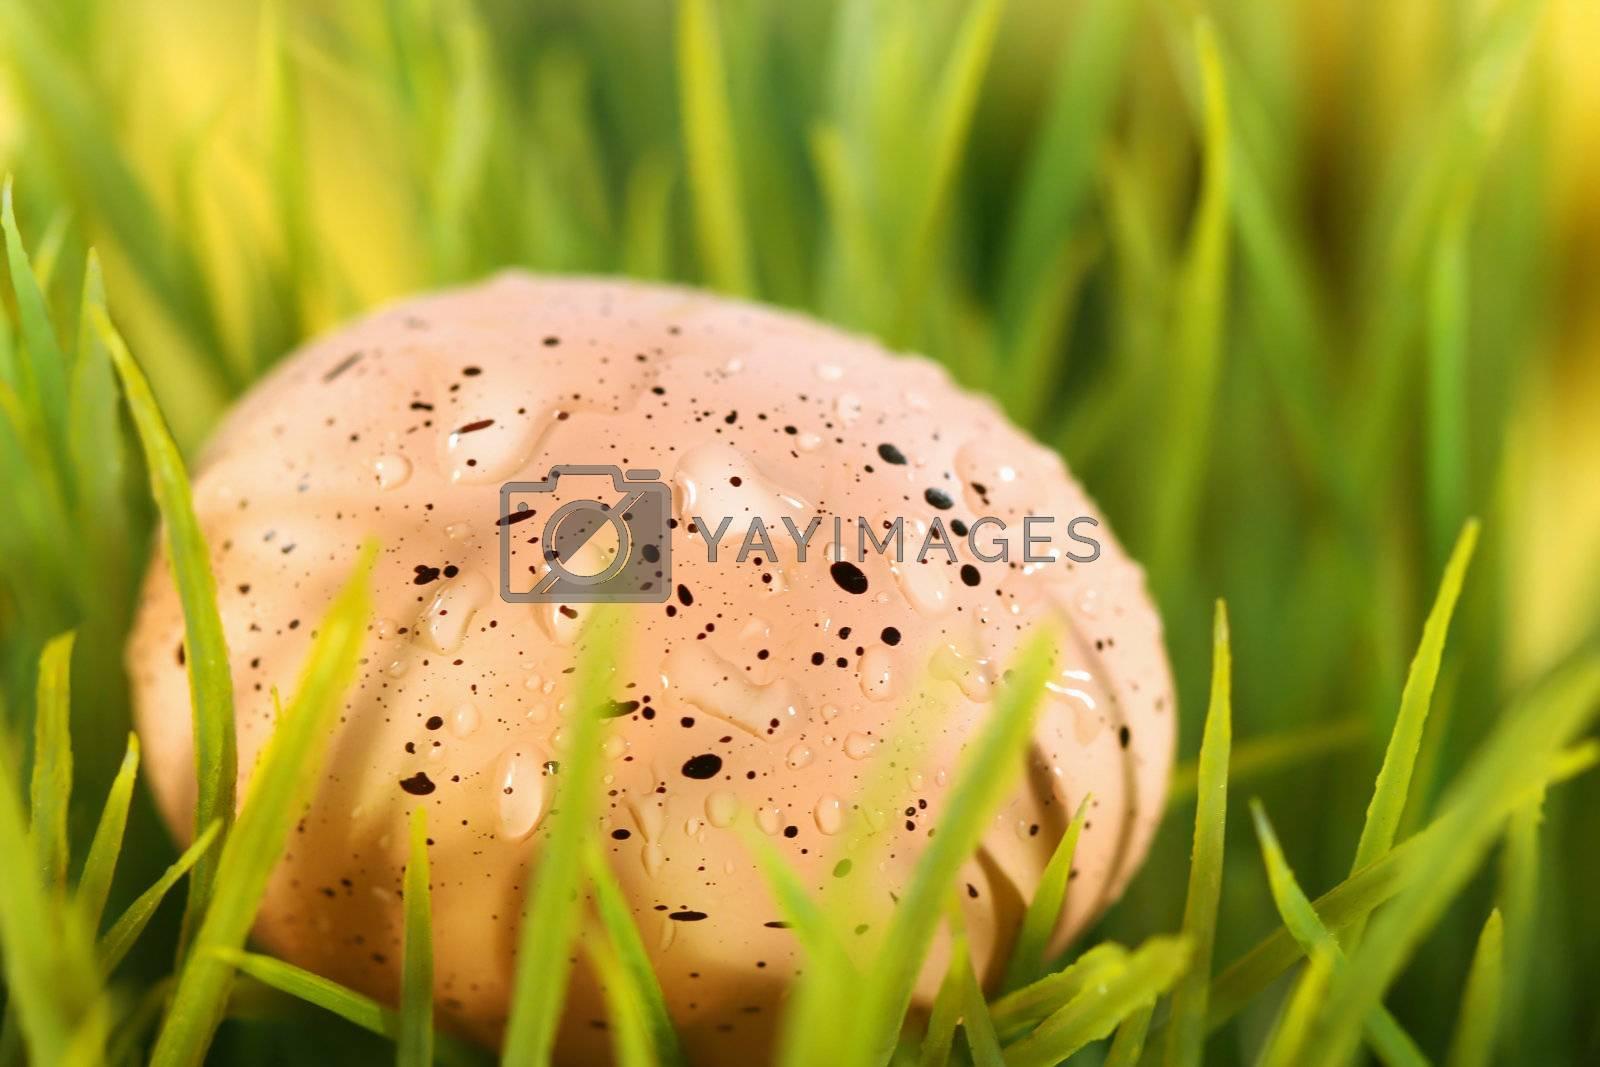 Pink Easter egg hidden in the grass